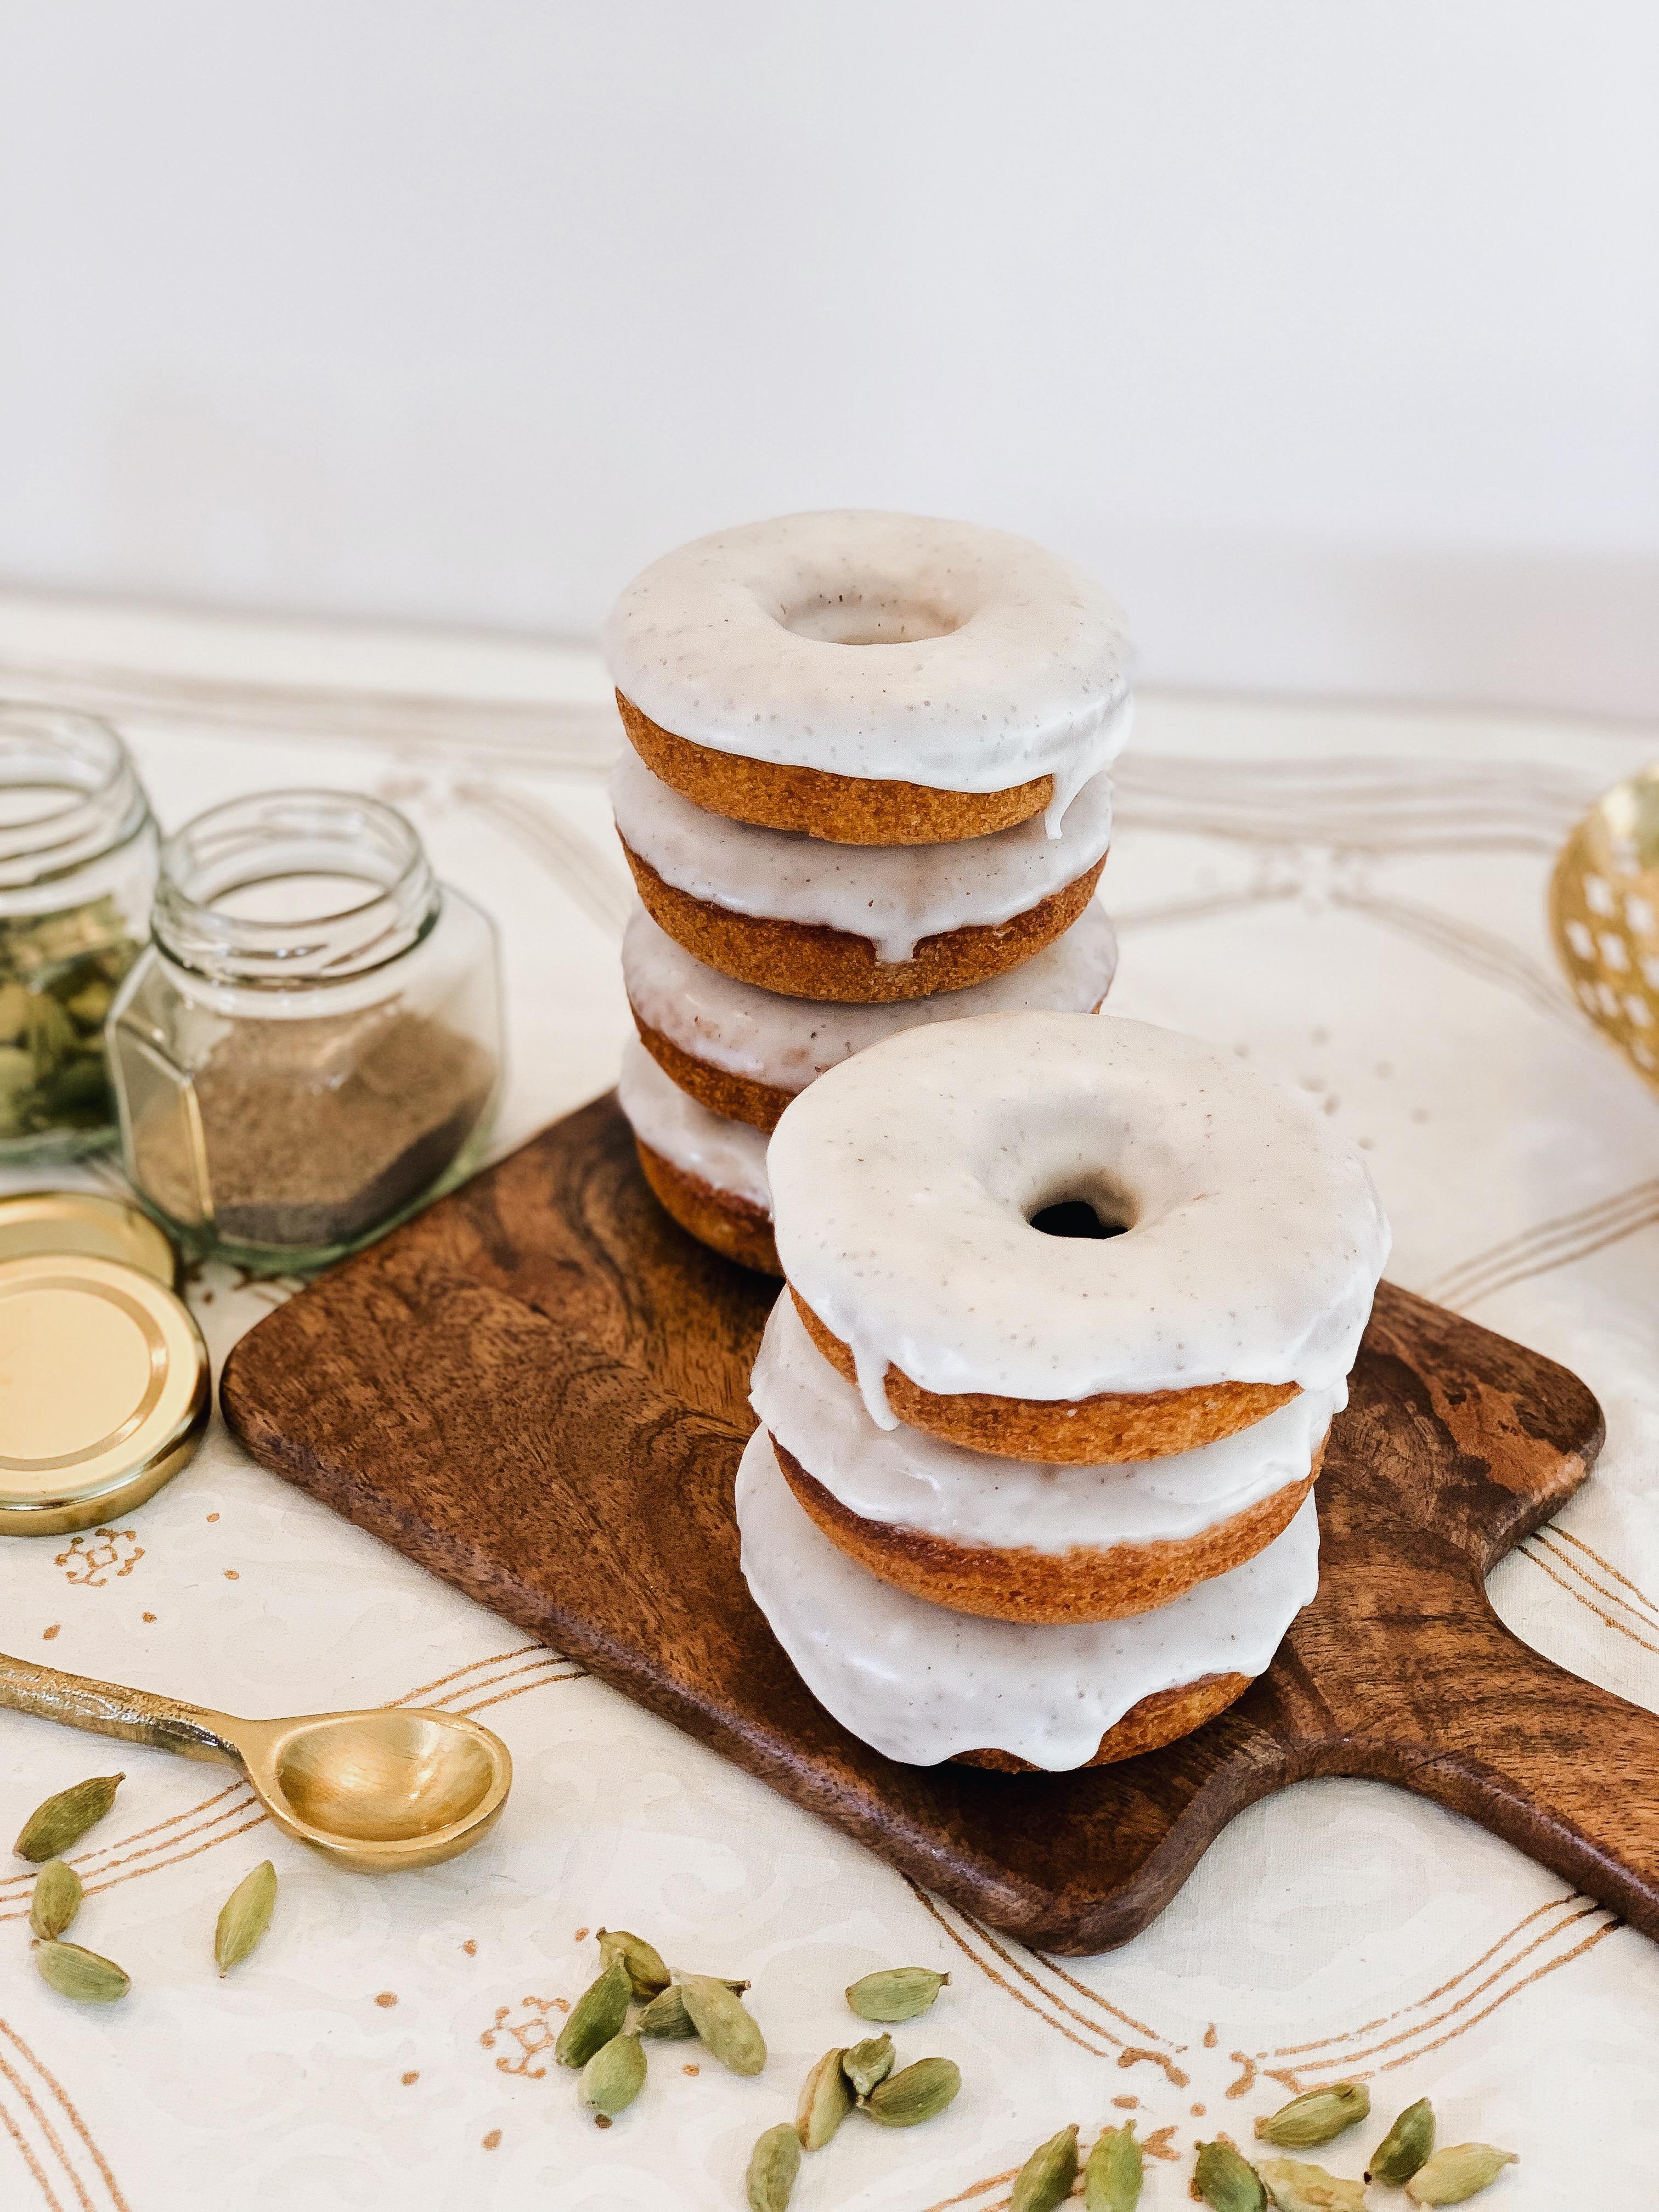 Baked Greek Yogurt Doughnuts with Cardamom and Vanilla